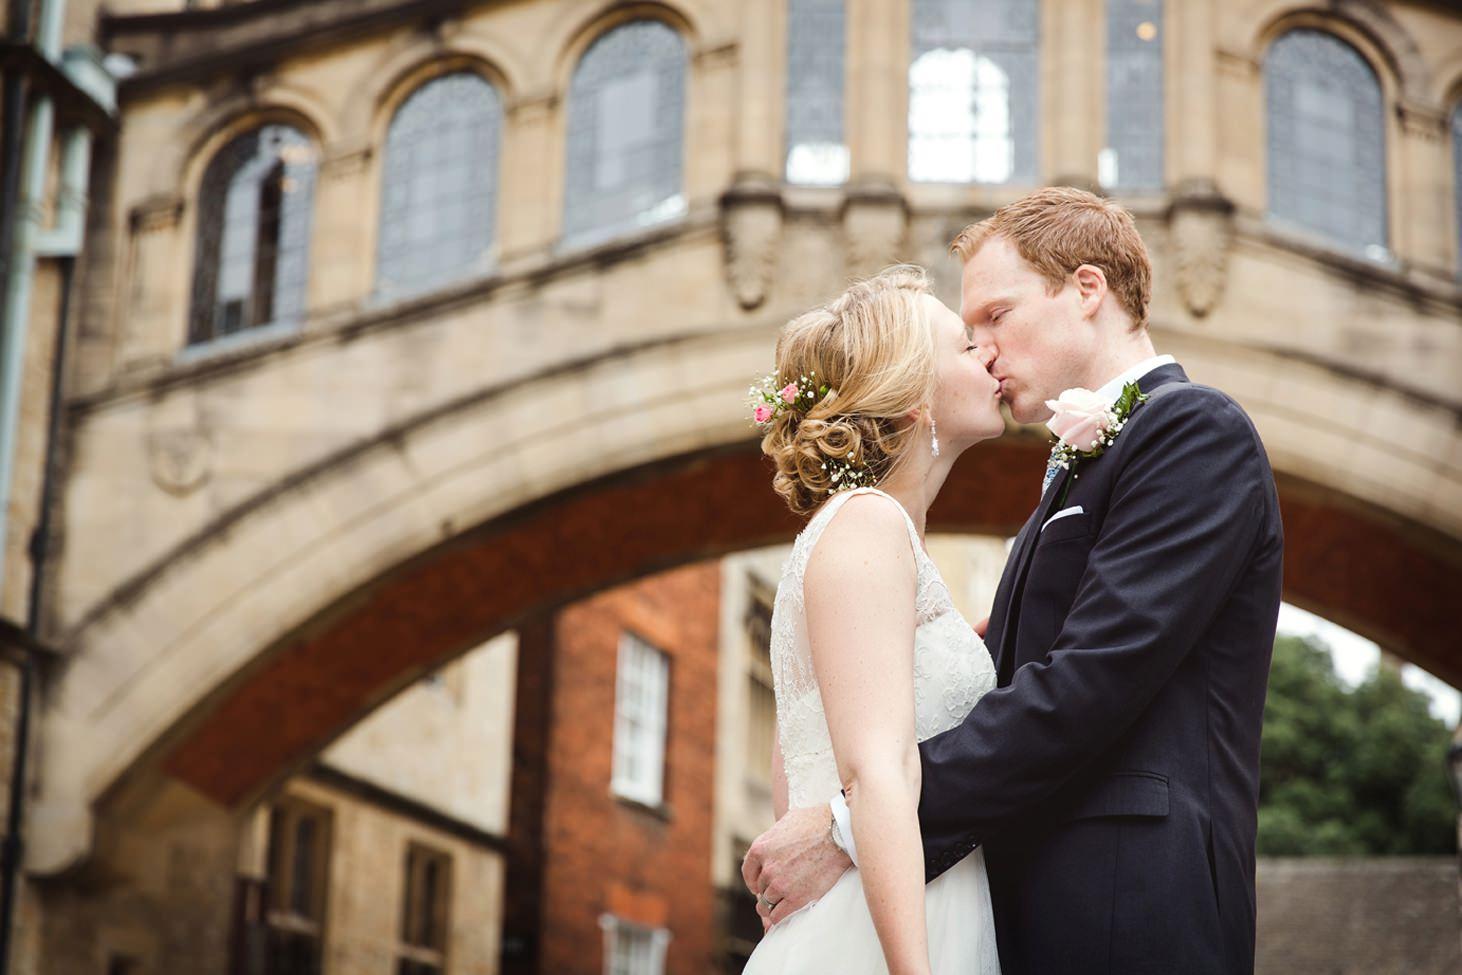 Bodleian library wedding bridge of sighs kissing portrait